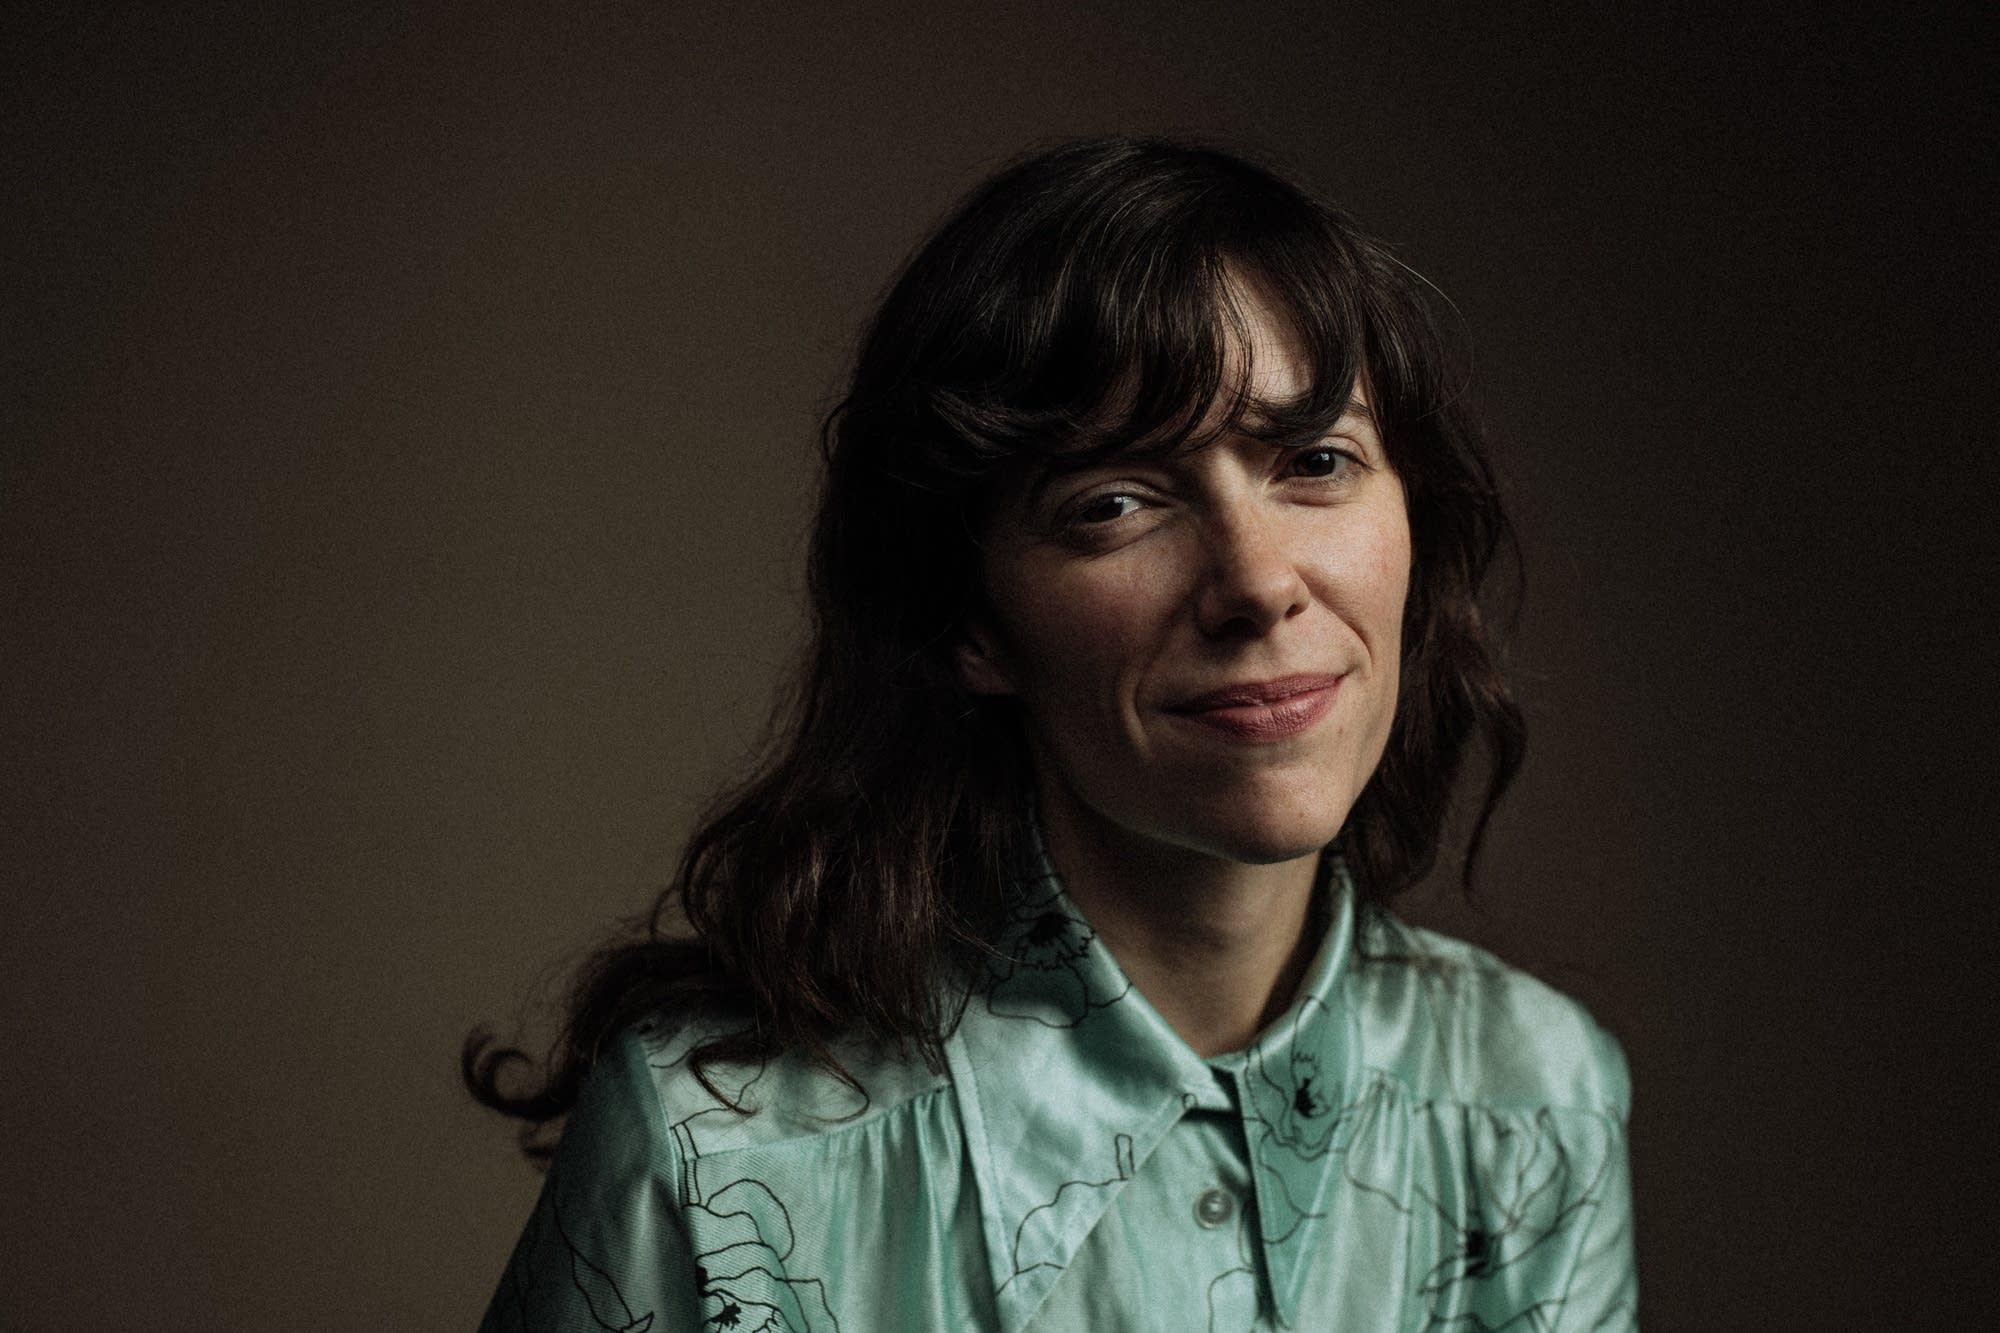 Natalie Prass visits The Current's studio